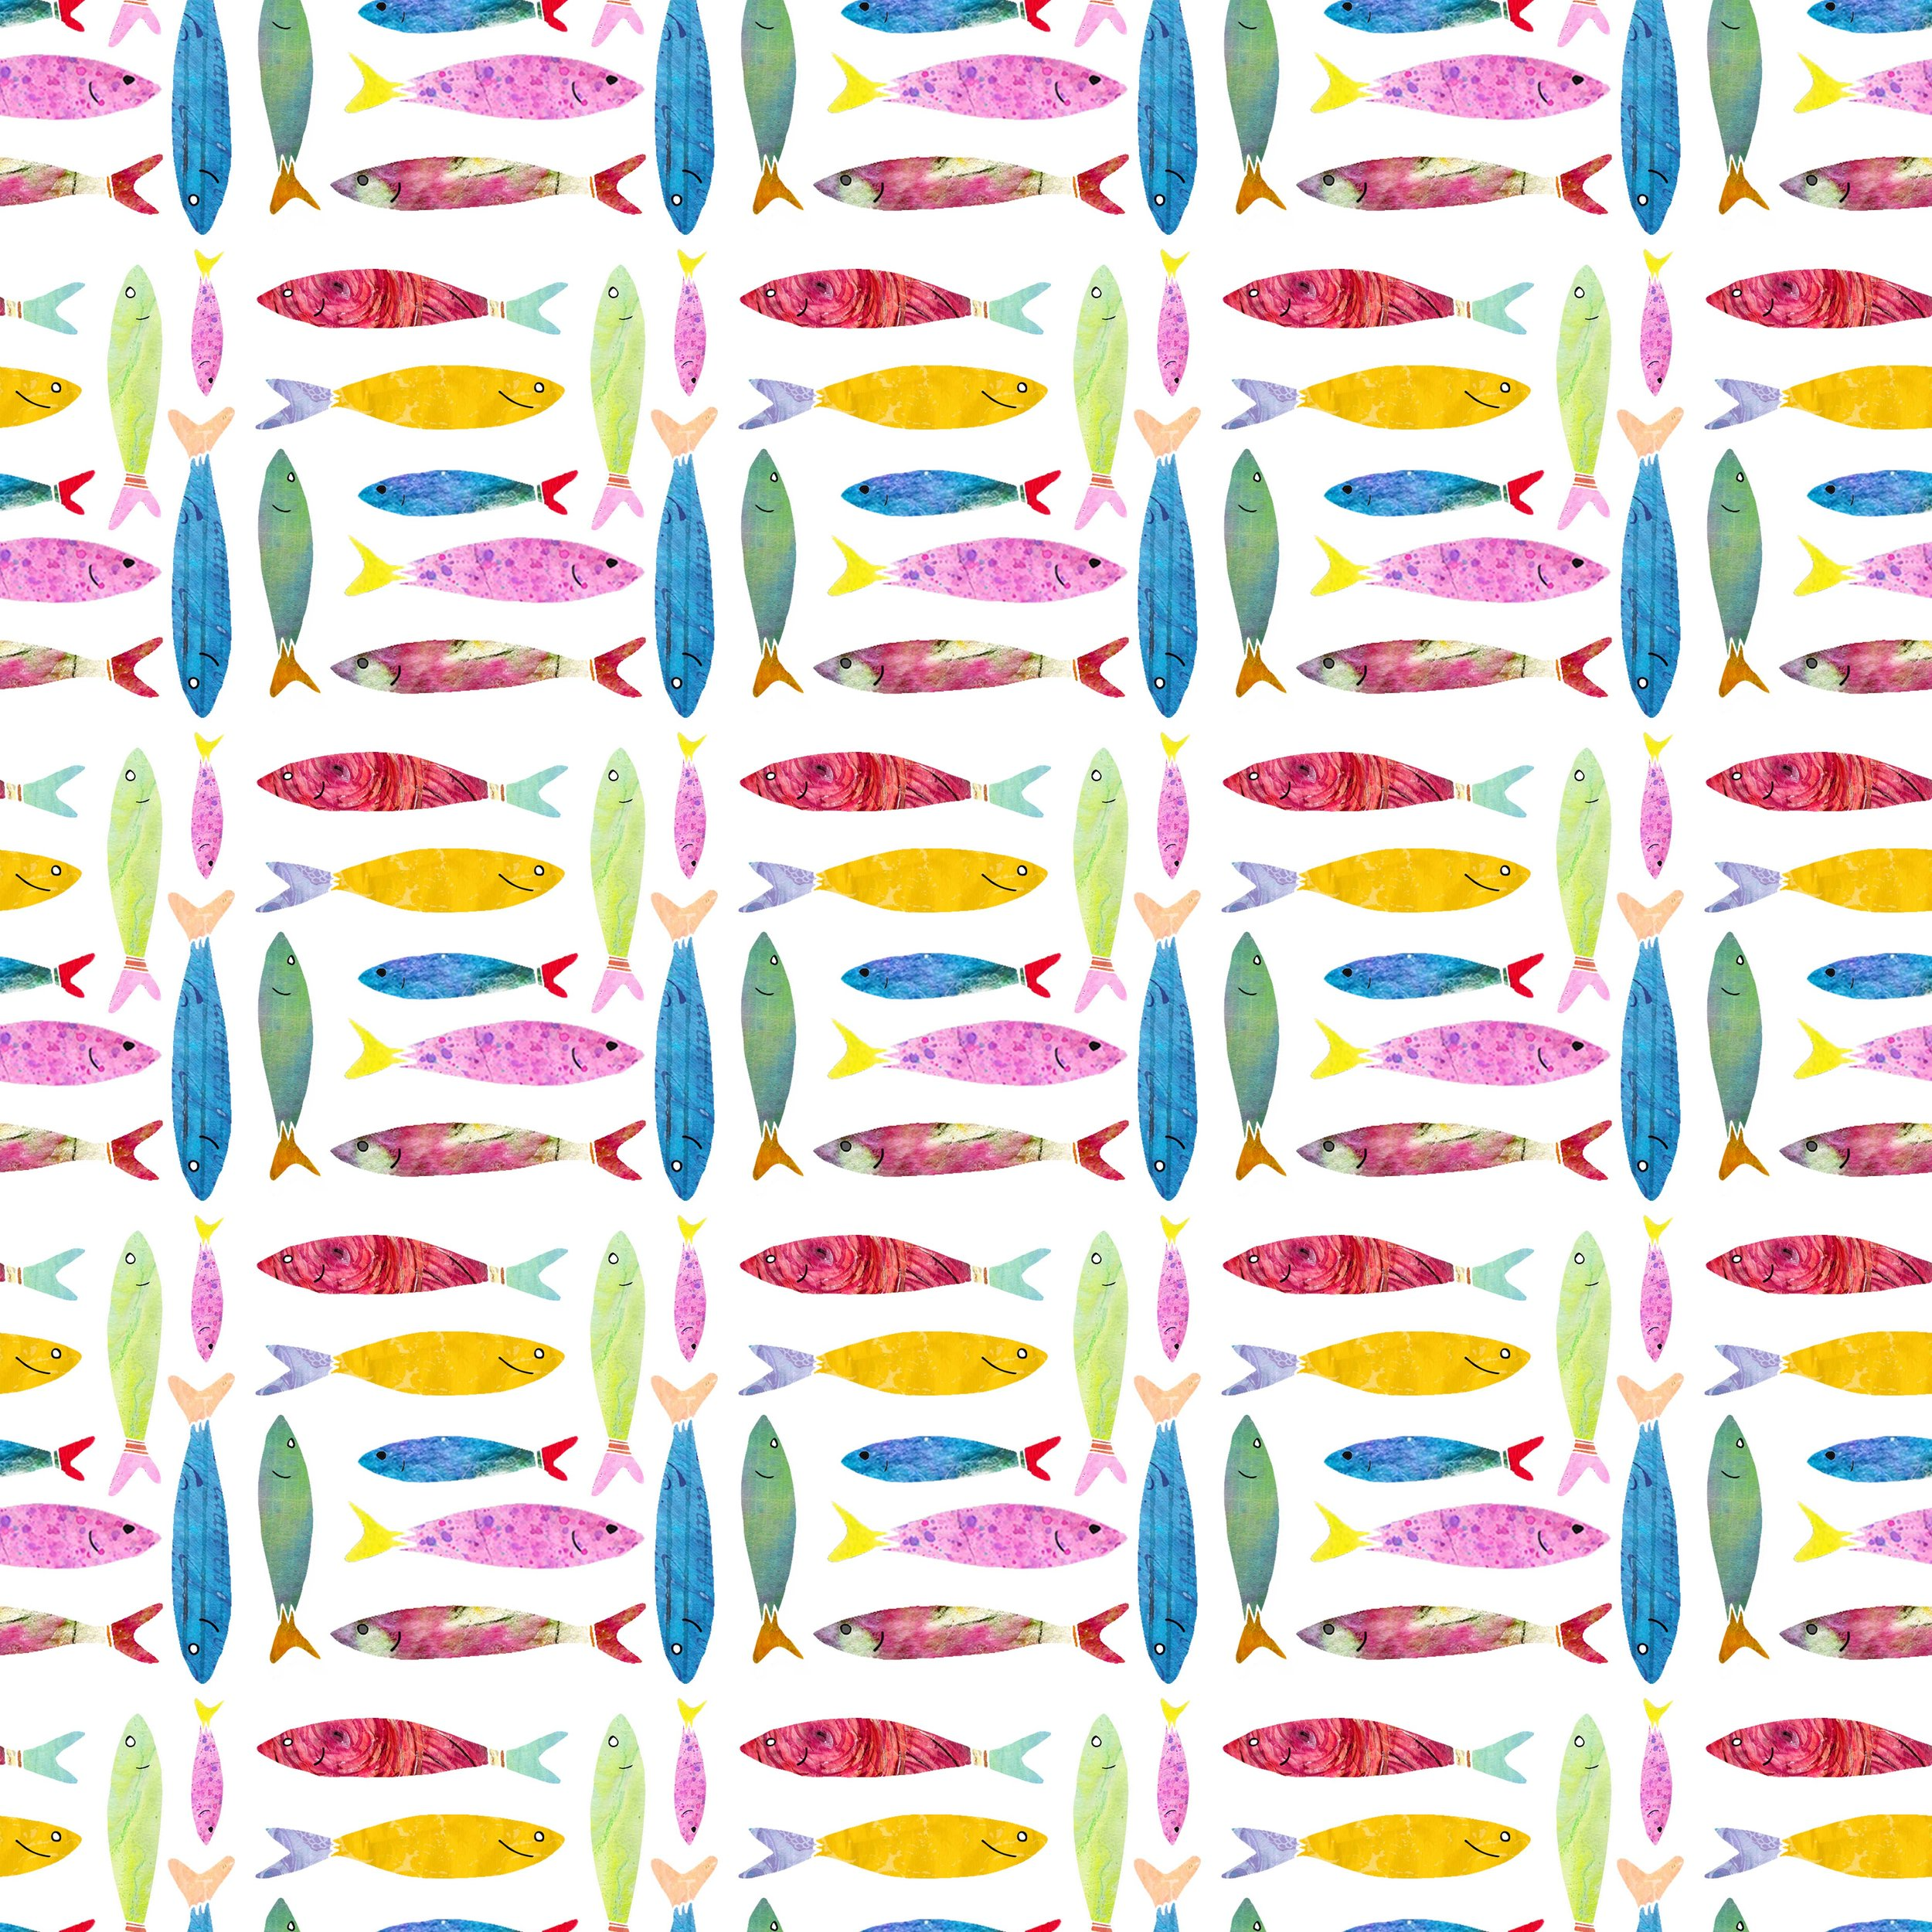 fish-pattern.jpg